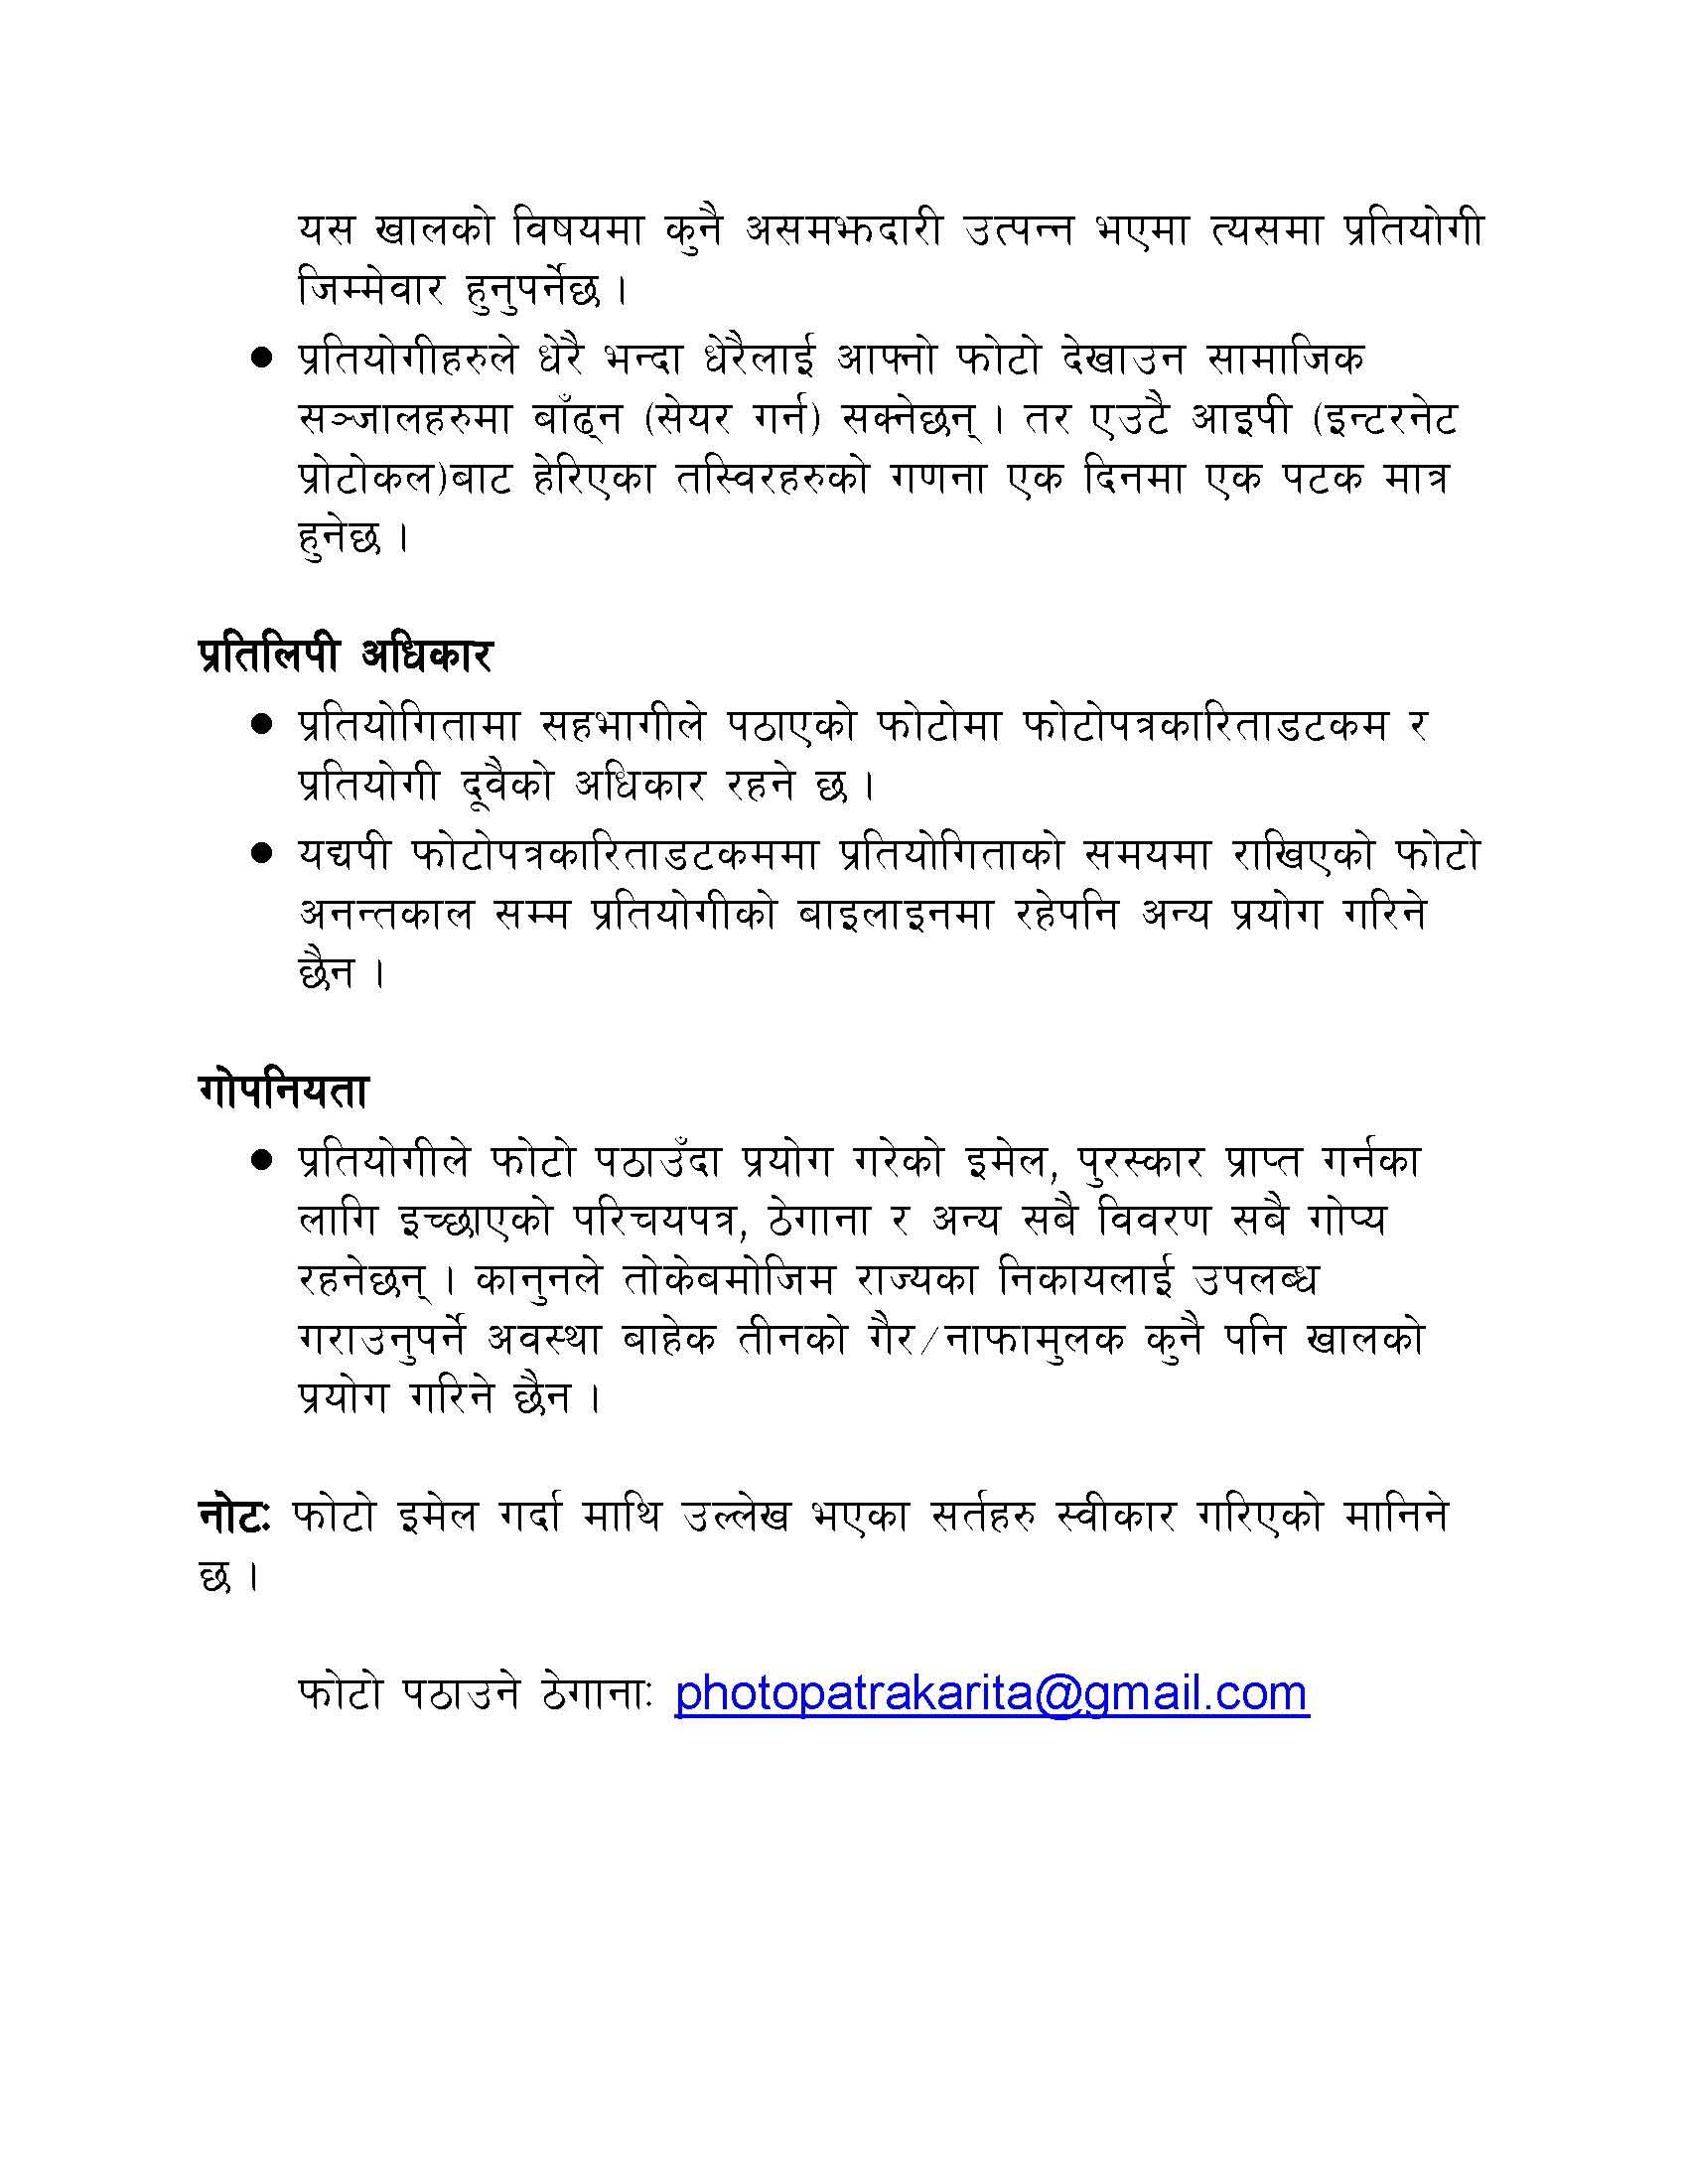 03 Photopatrakarita World Nepalese Online Photo Competition